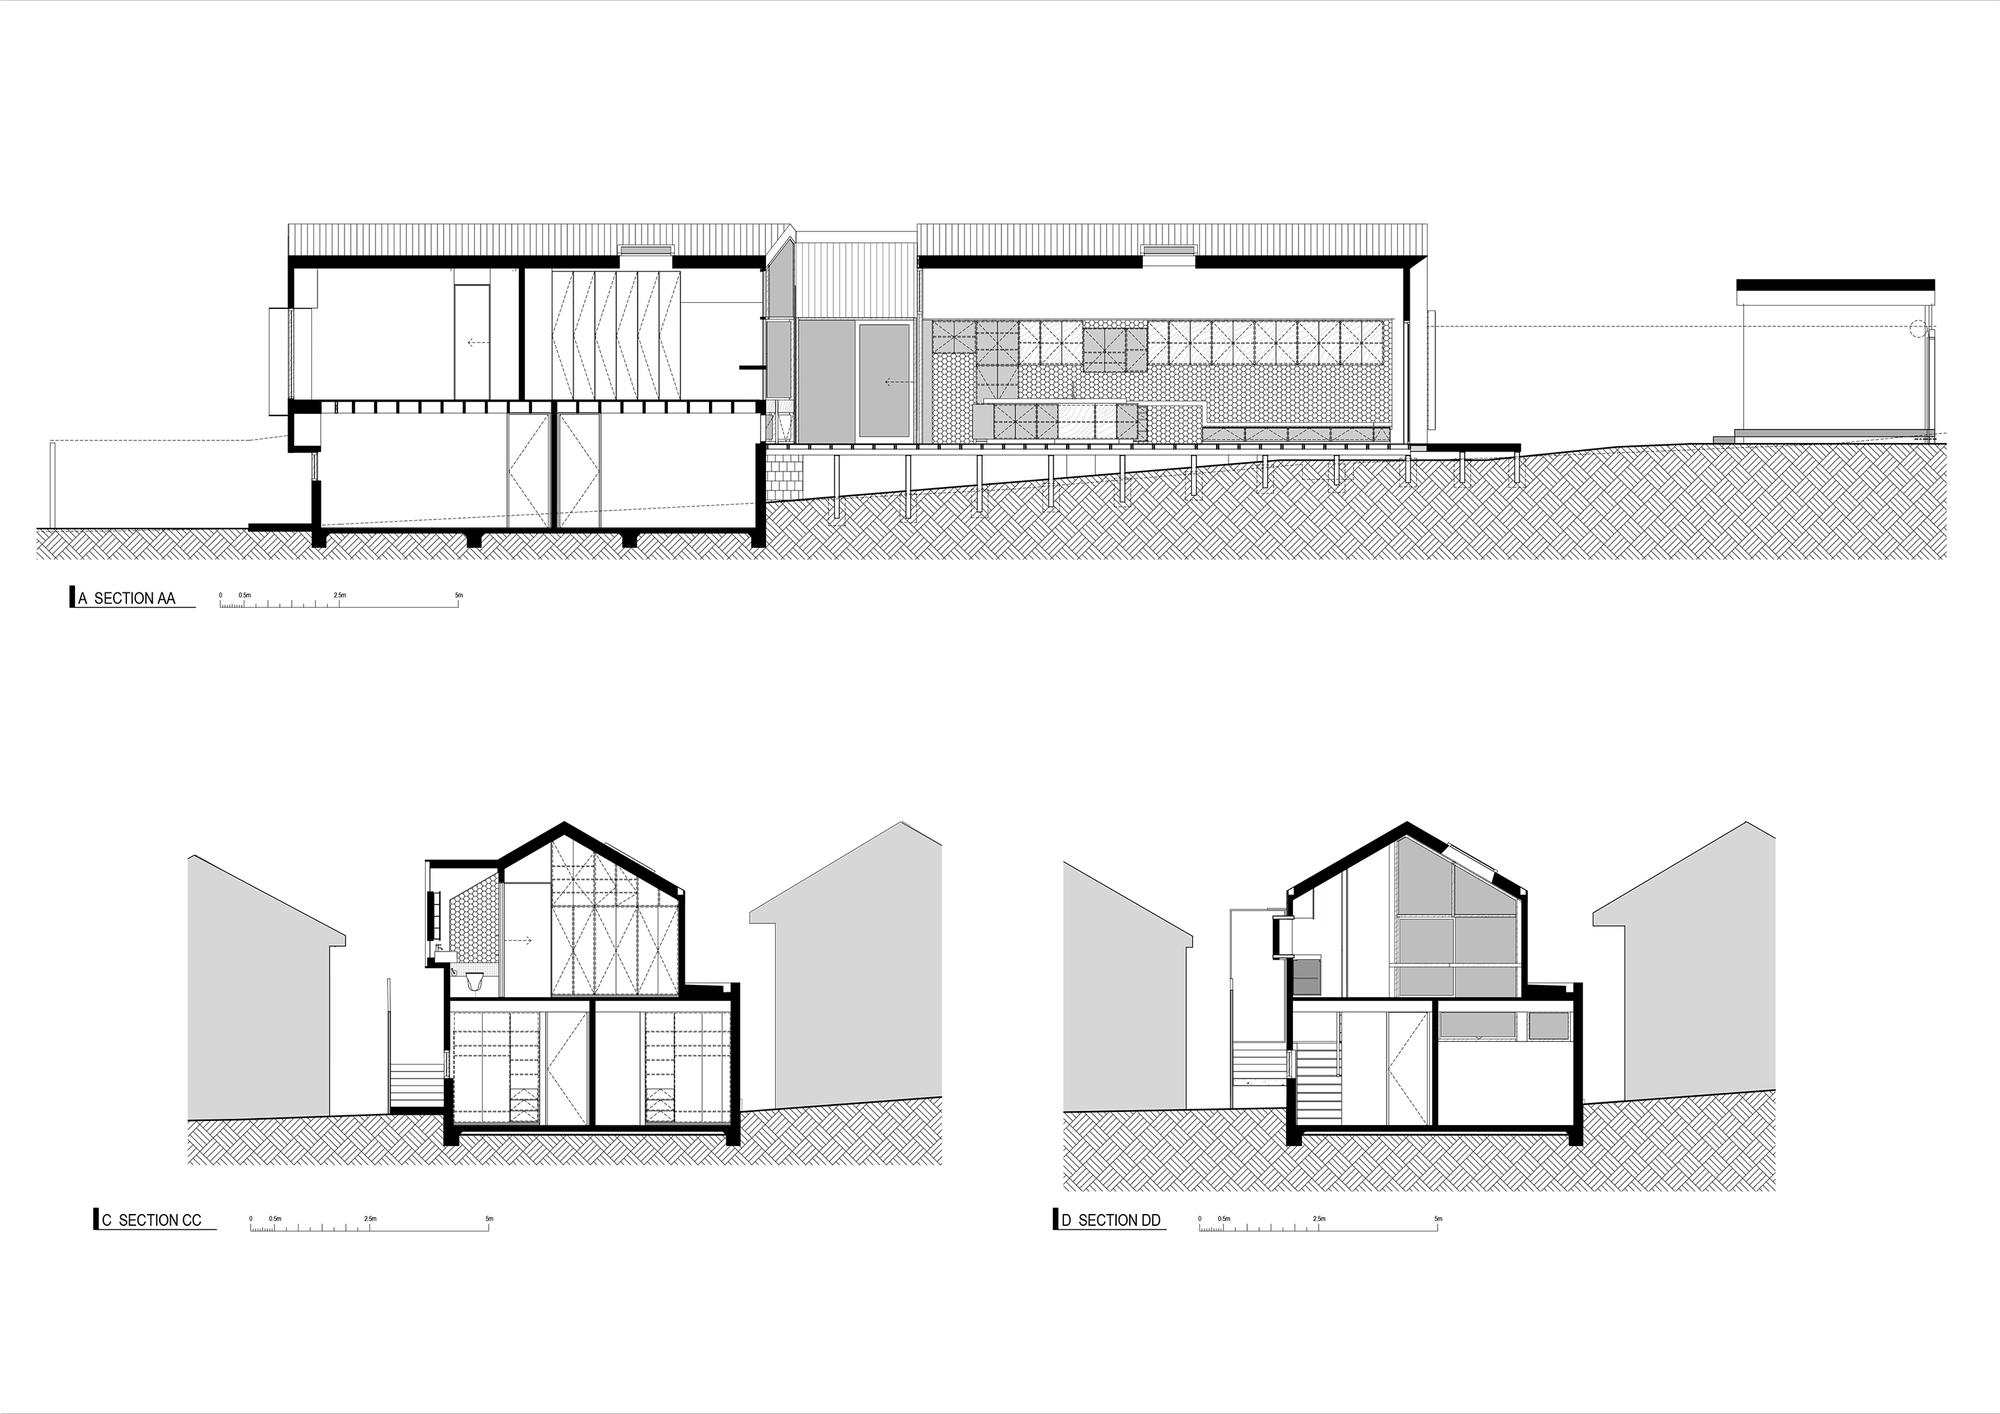 medium resolution of sections